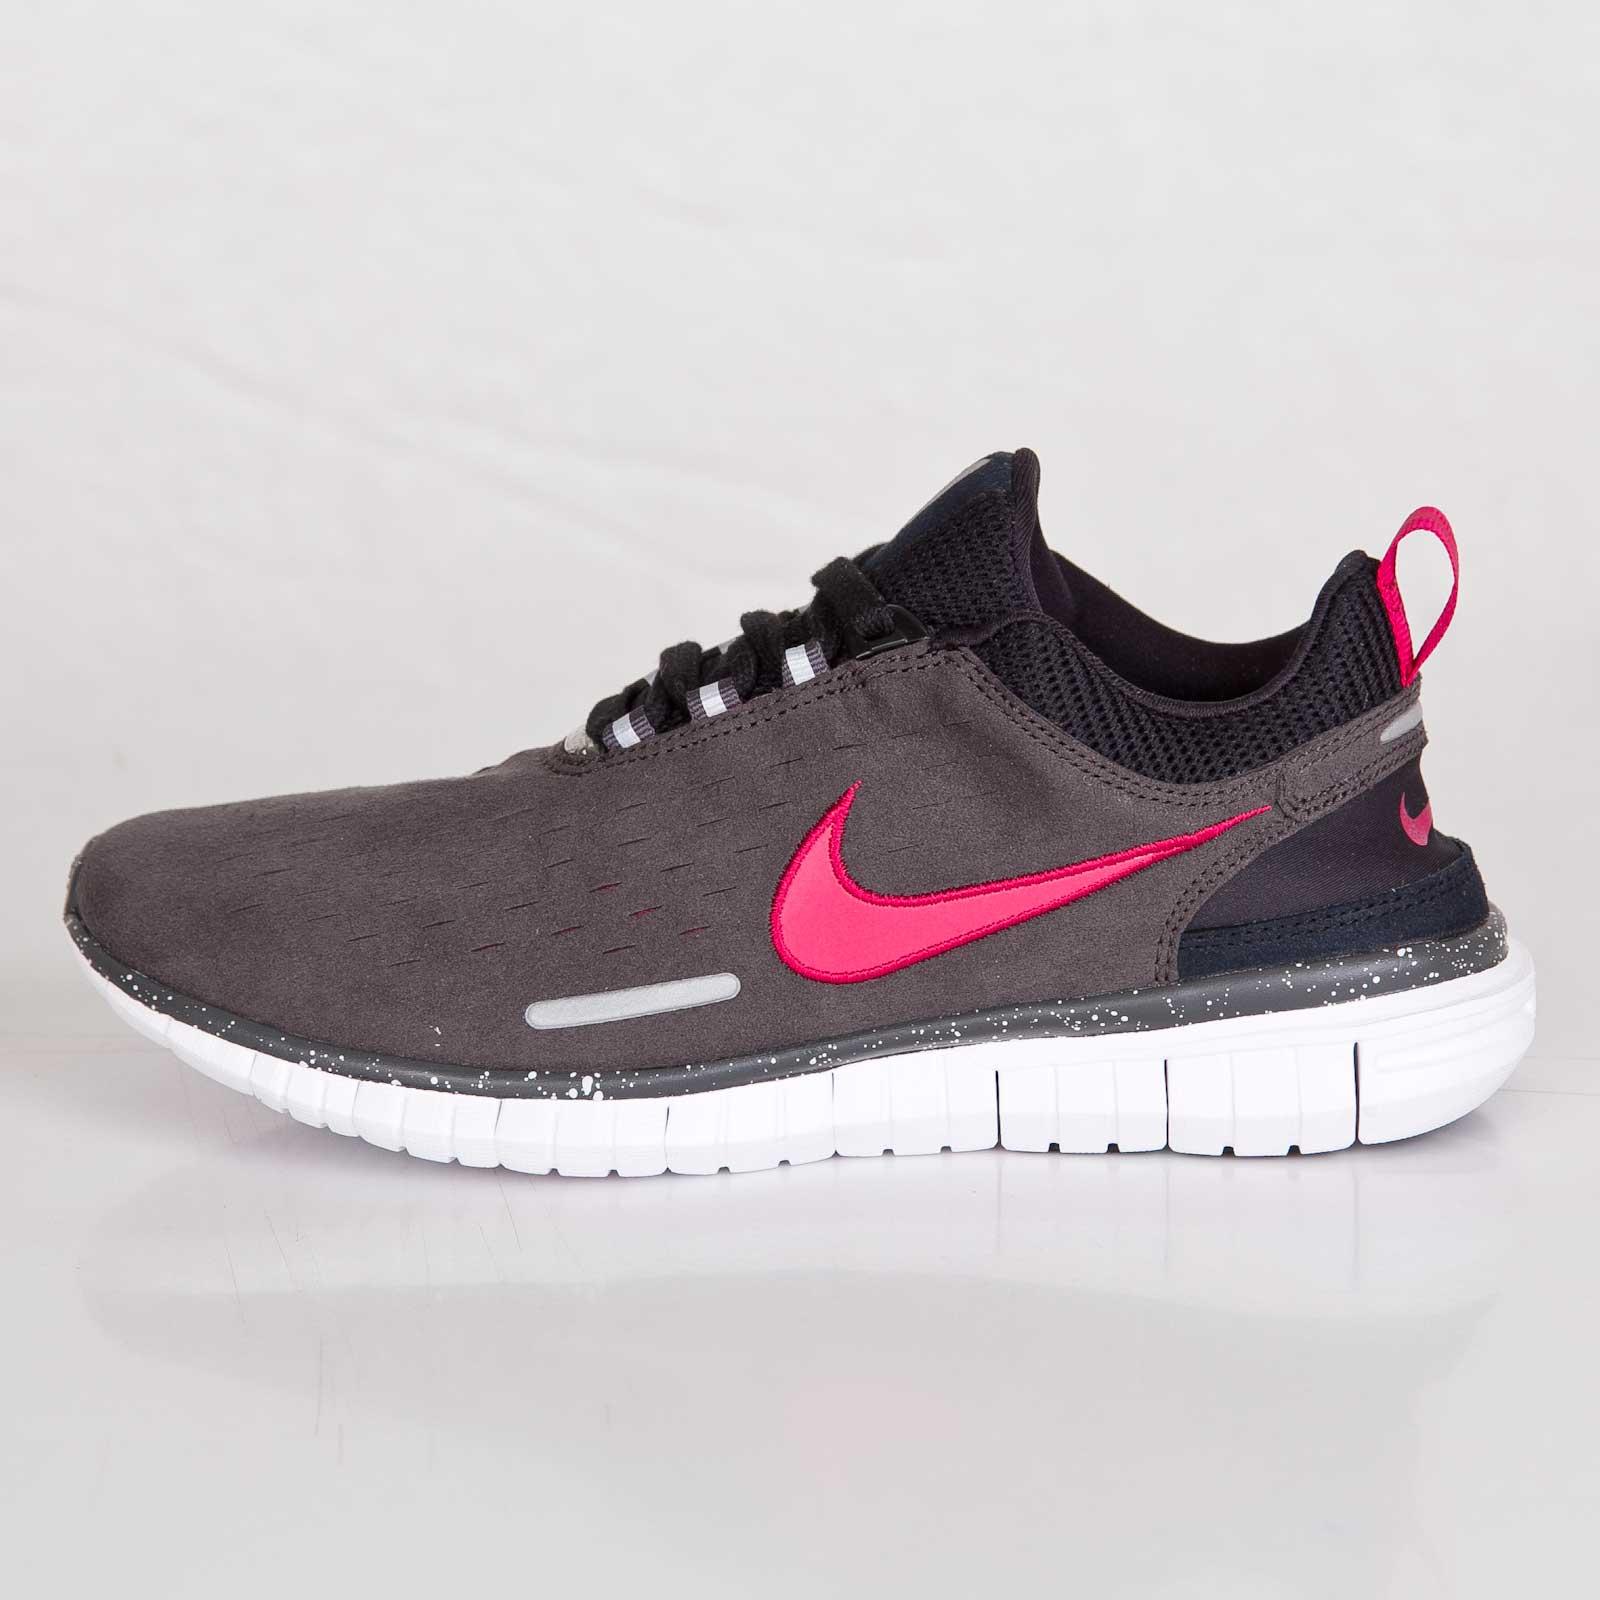 0a943b7e5302 Nike Free OG 14 - 642402-200 - Sneakersnstuff